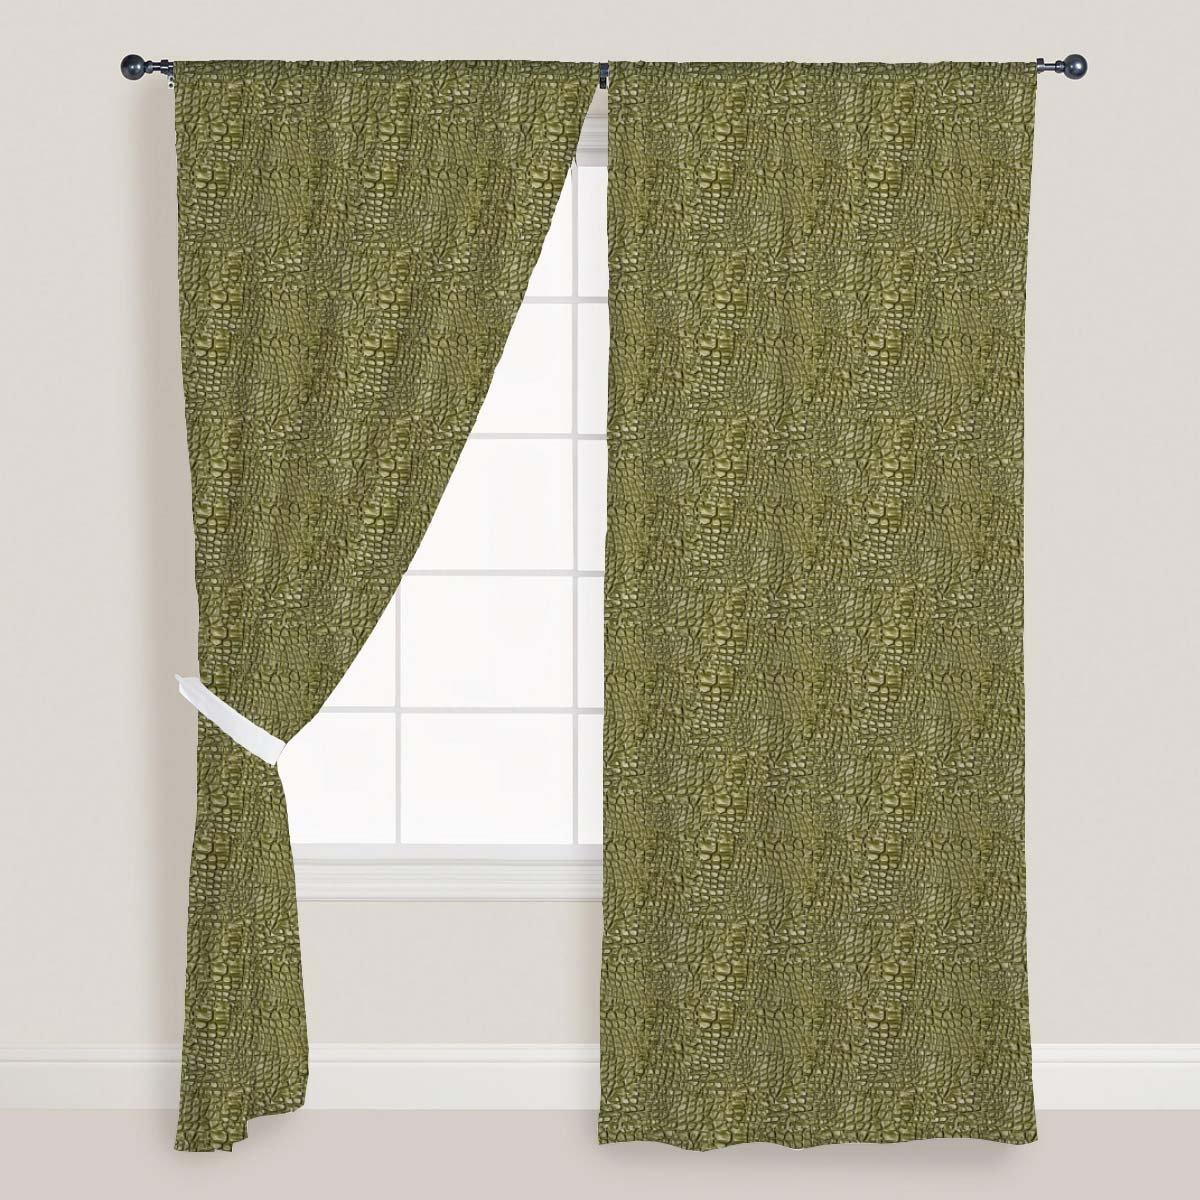 AZ Alligator Hide Door & Window Curtain Satin 4feet x 11feet; SET OF 2 PCS